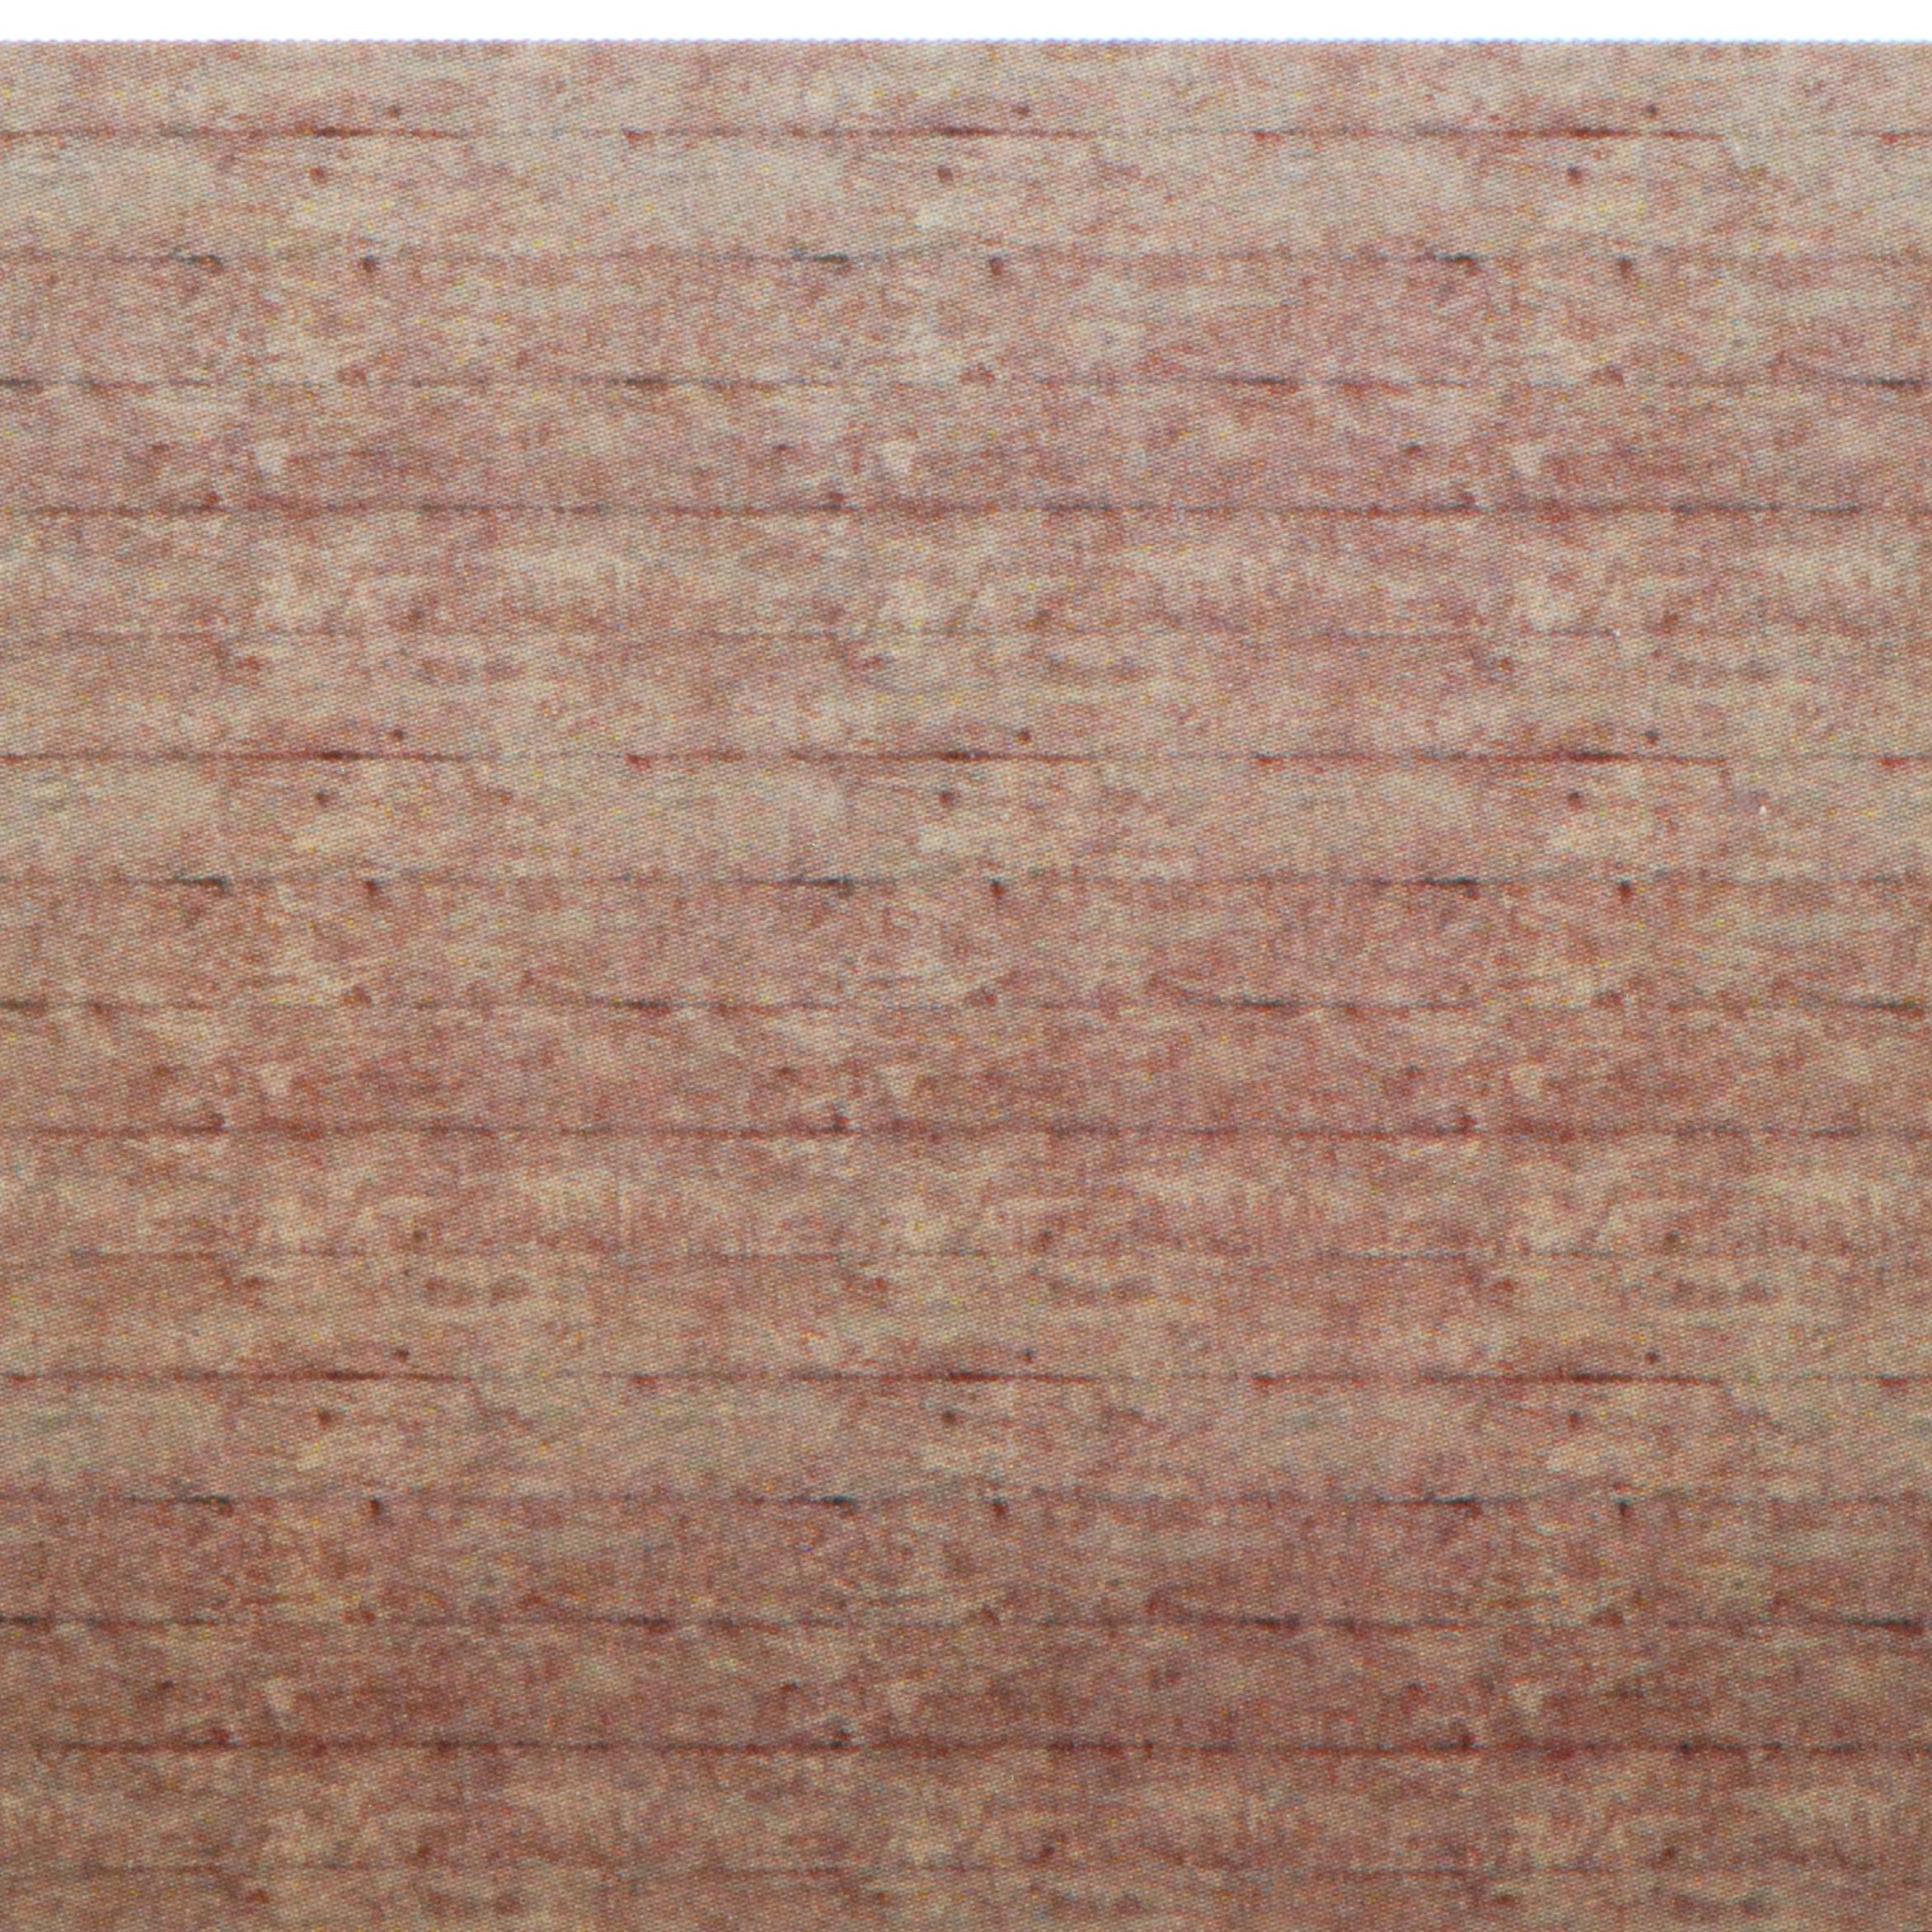 dollhouse wallpaper flooring and brick - photo #22